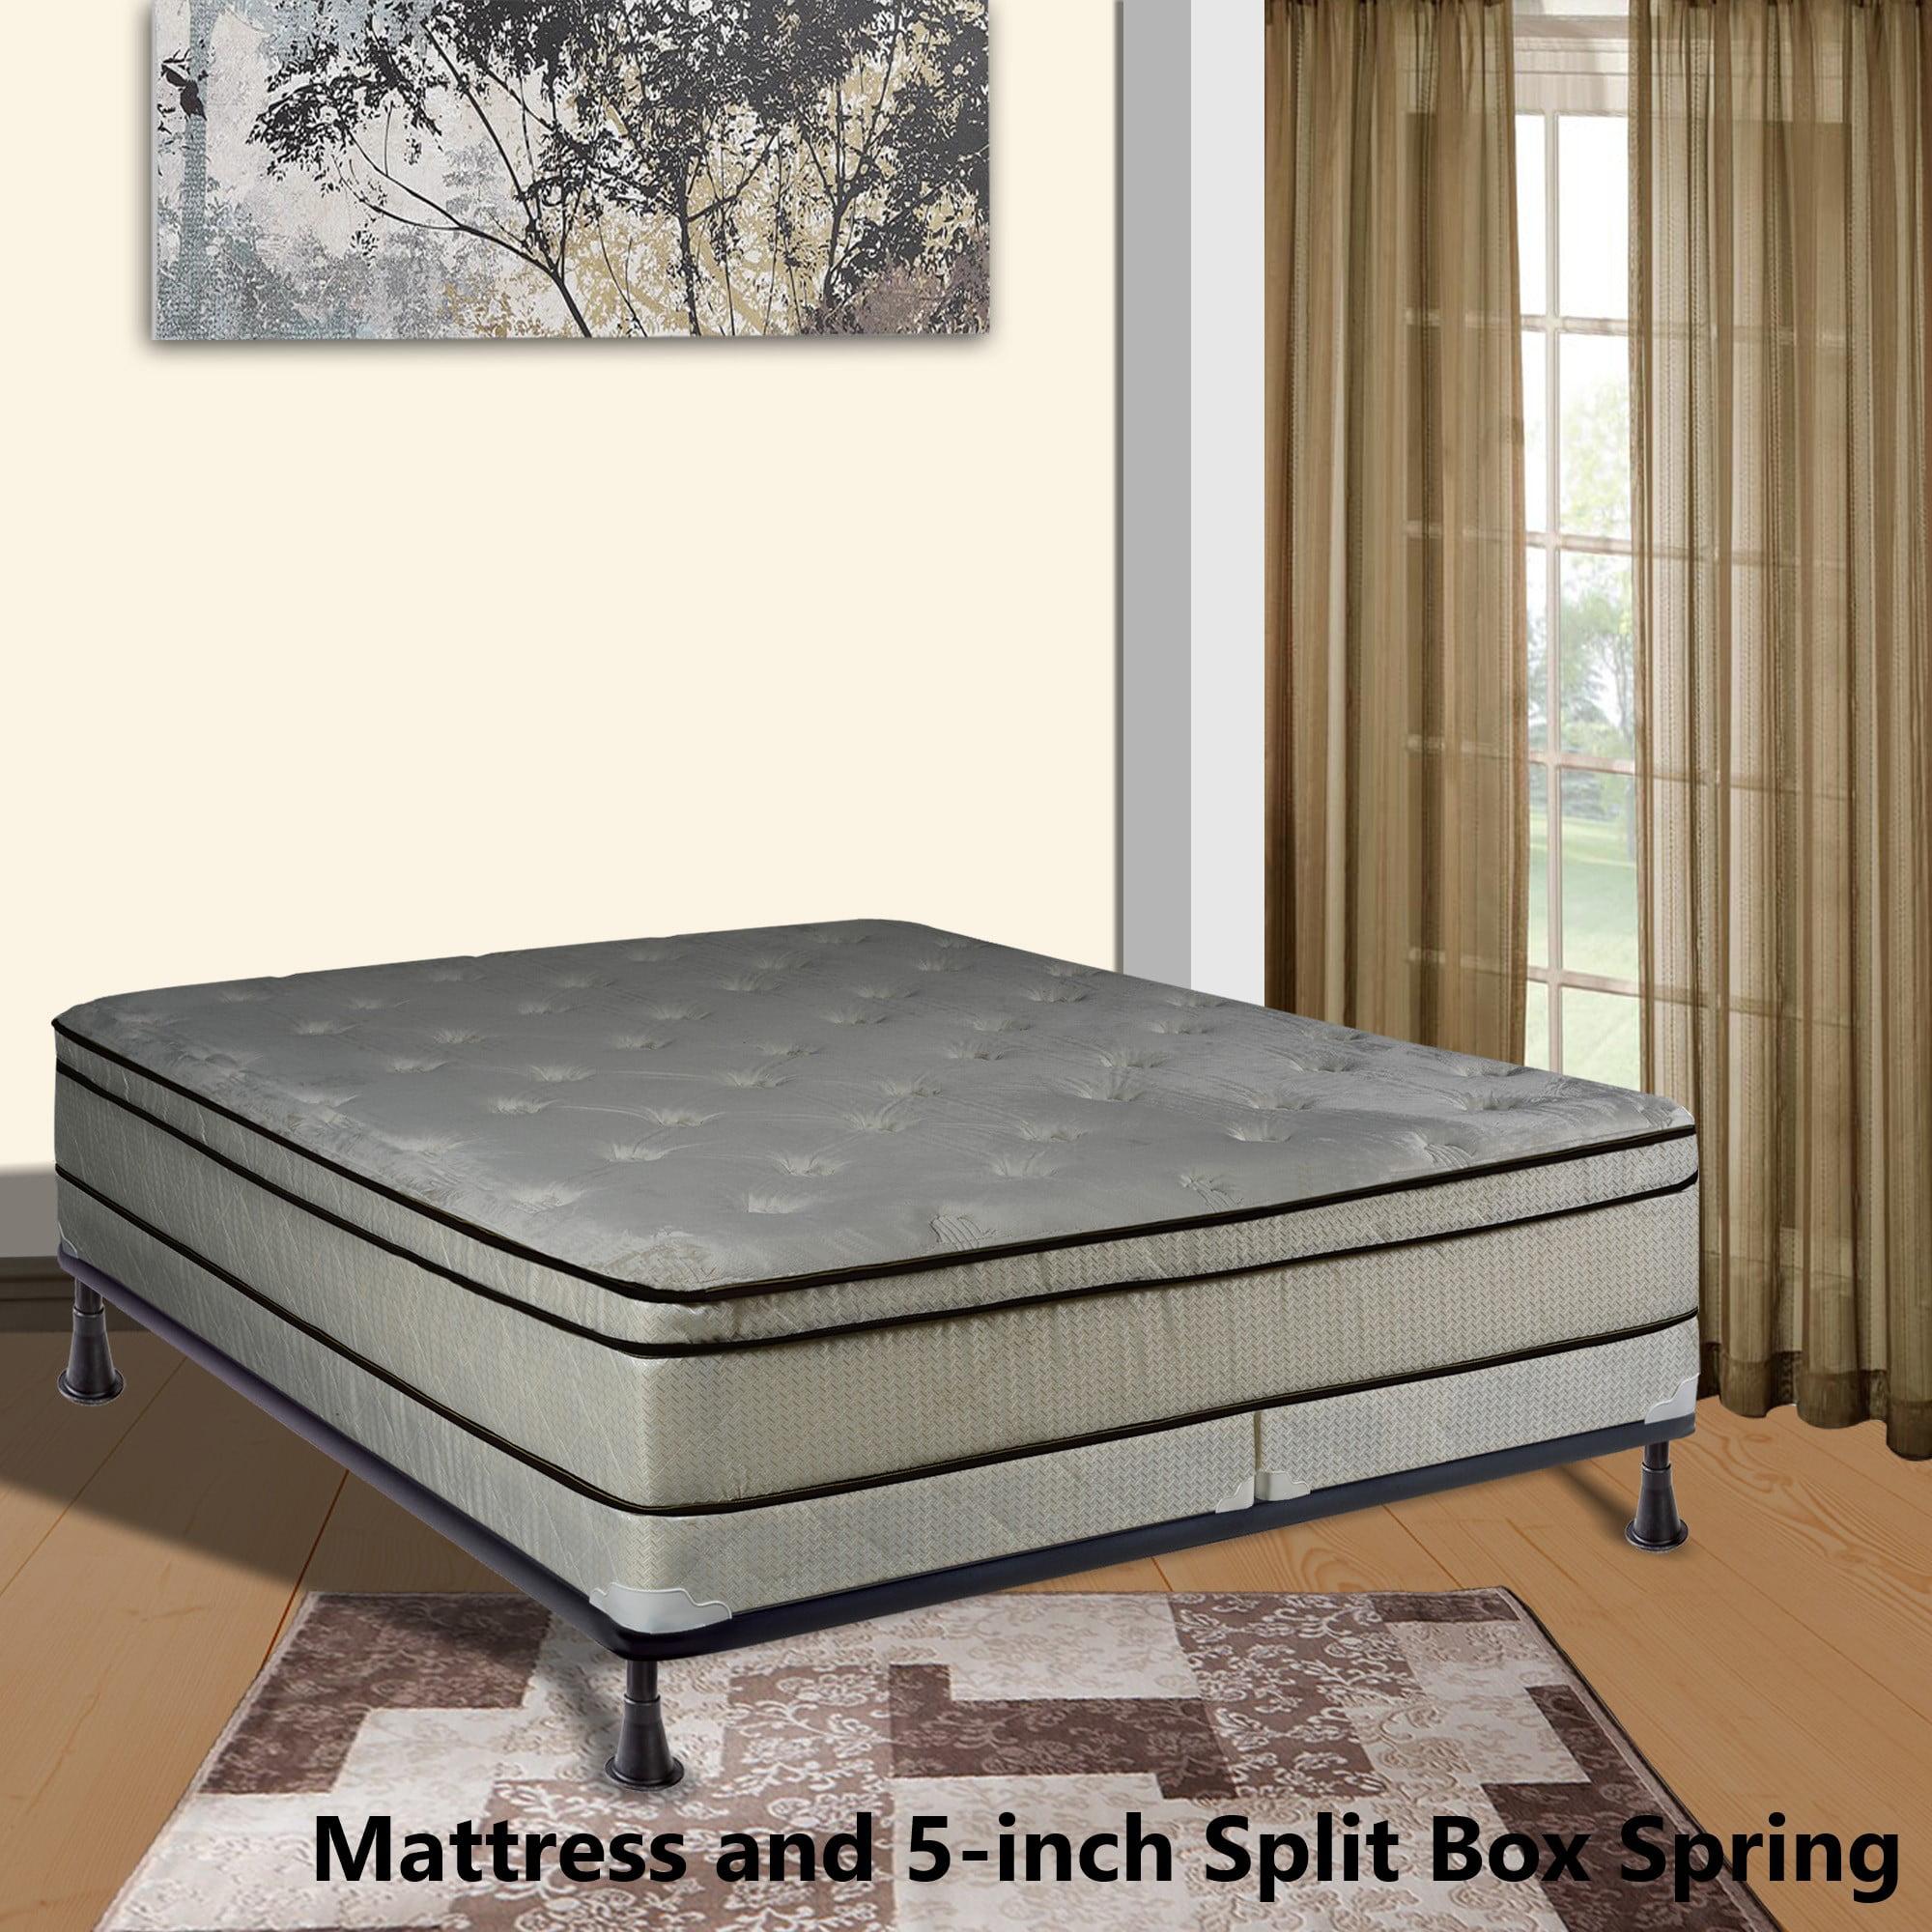 "Continental Sleep, 11-inch Fully Assembled FOAM ENCASED Innerspring Heavy plush Teddy Bear Fabric Mattress and 4"" Split Box Spring, Twin Size"